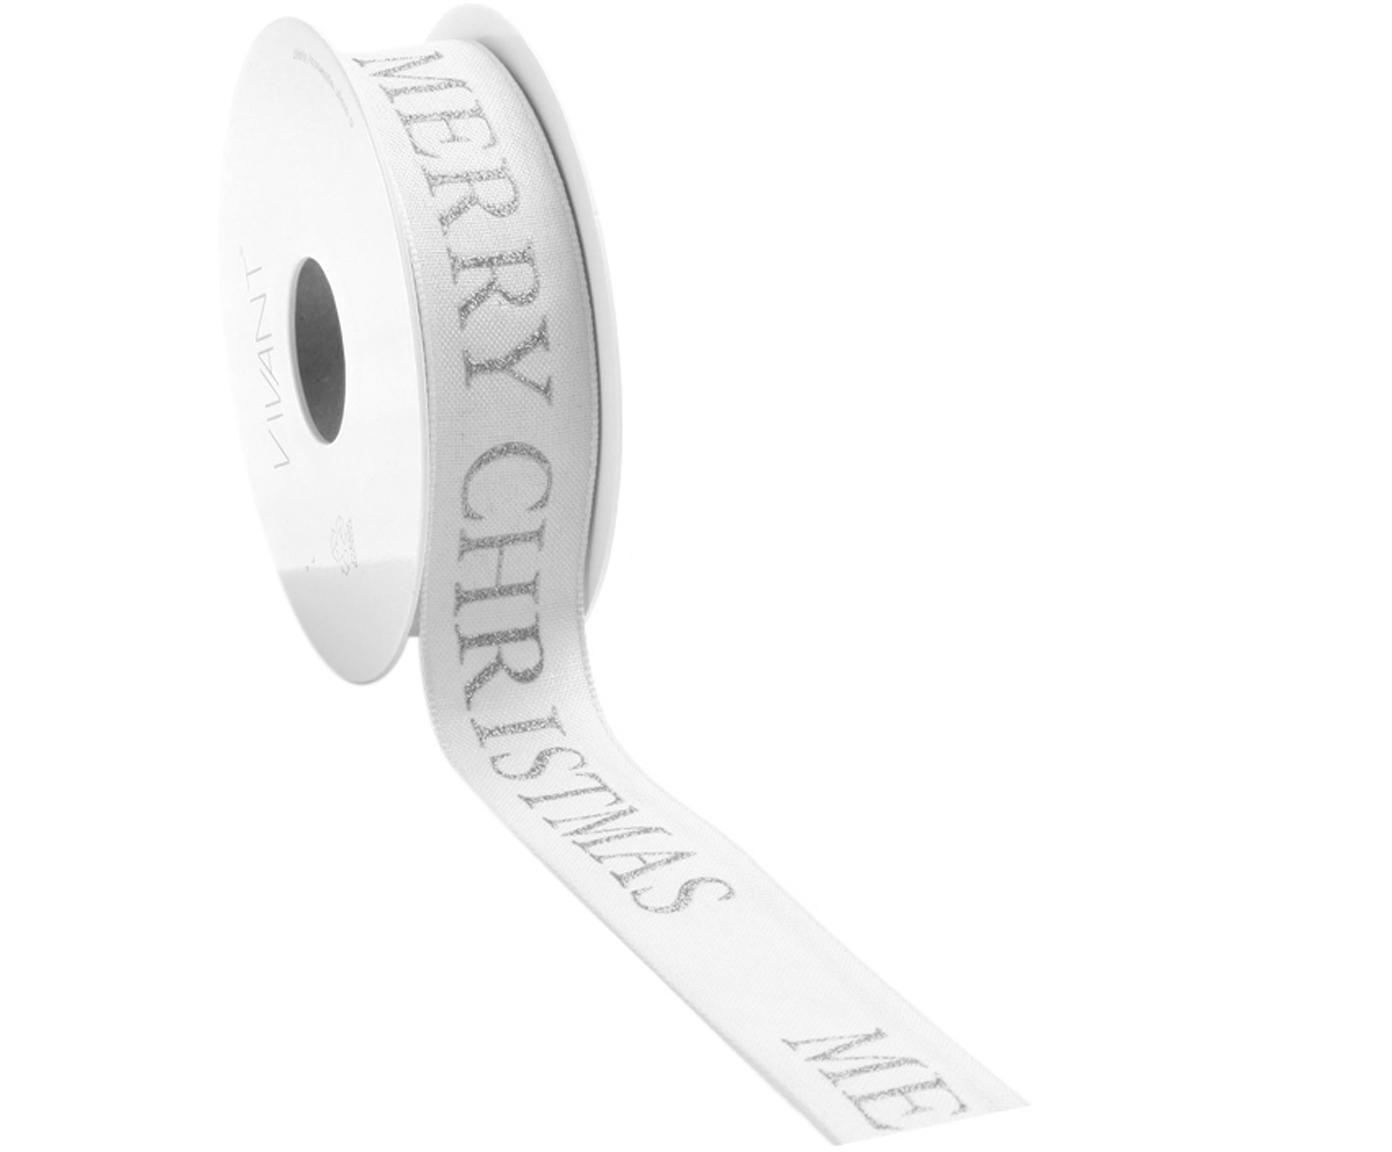 Cadeaulint Textire, Polyester, Wit, zilverkleurig, 3 x 1500 cm